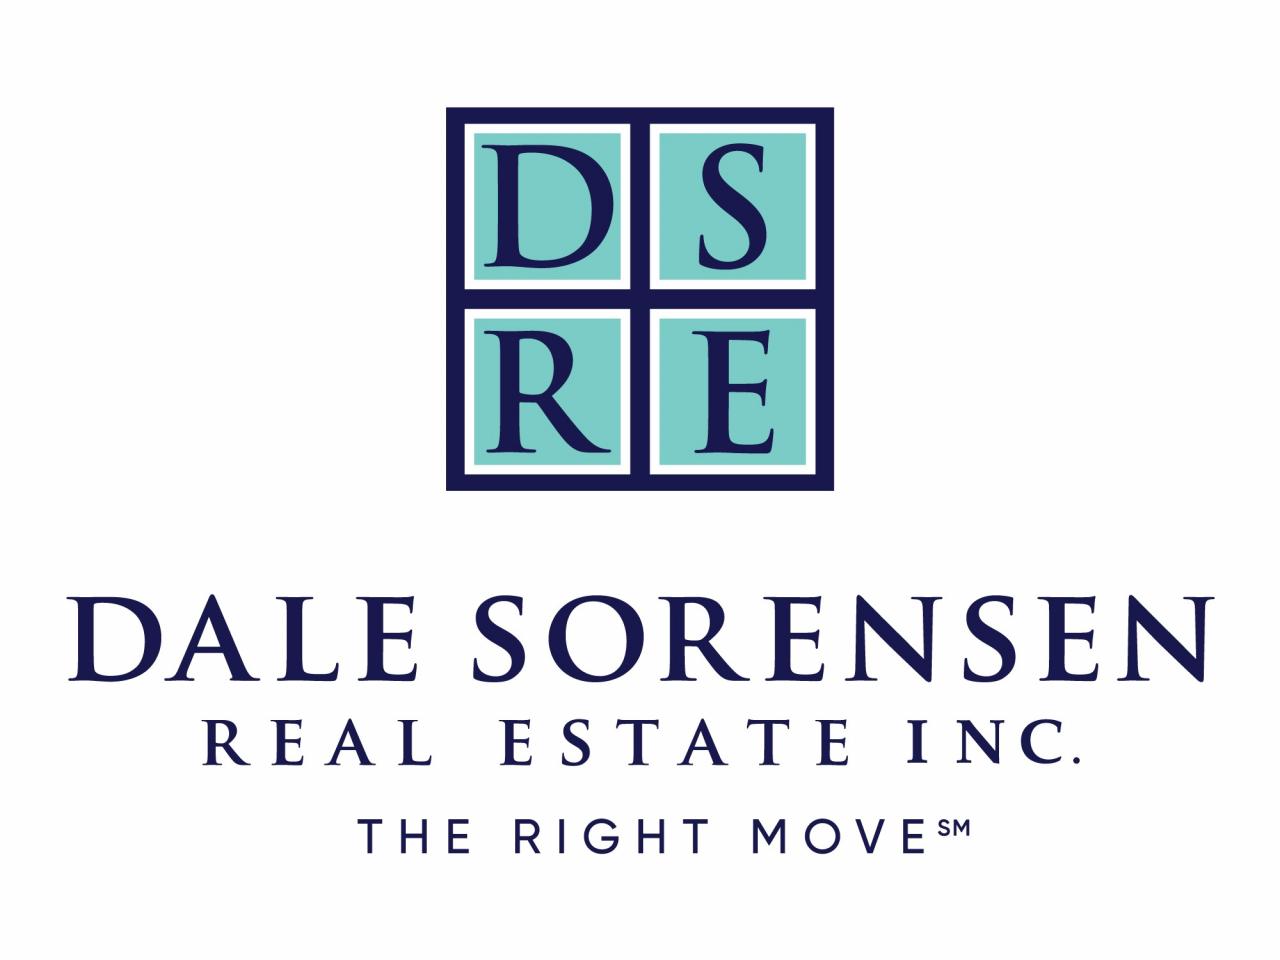 Dale Sorensen Real Estate logo